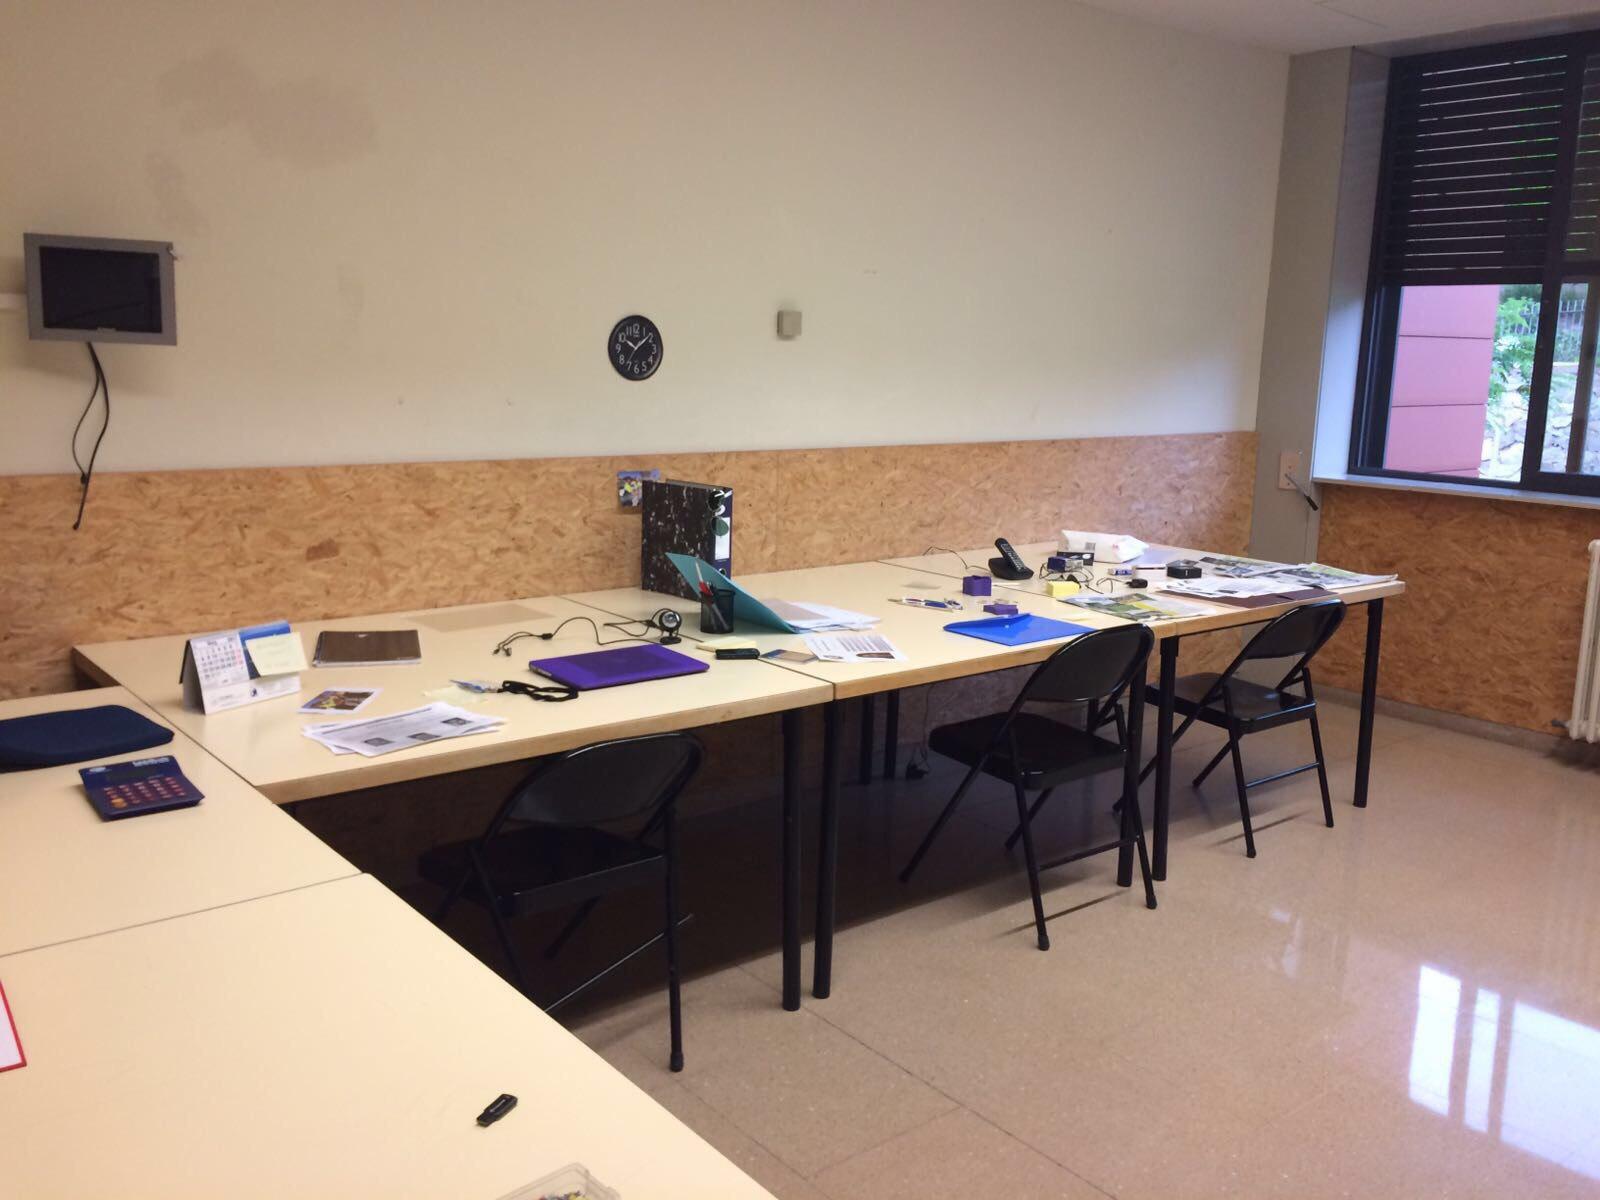 Scape Room Els Otano